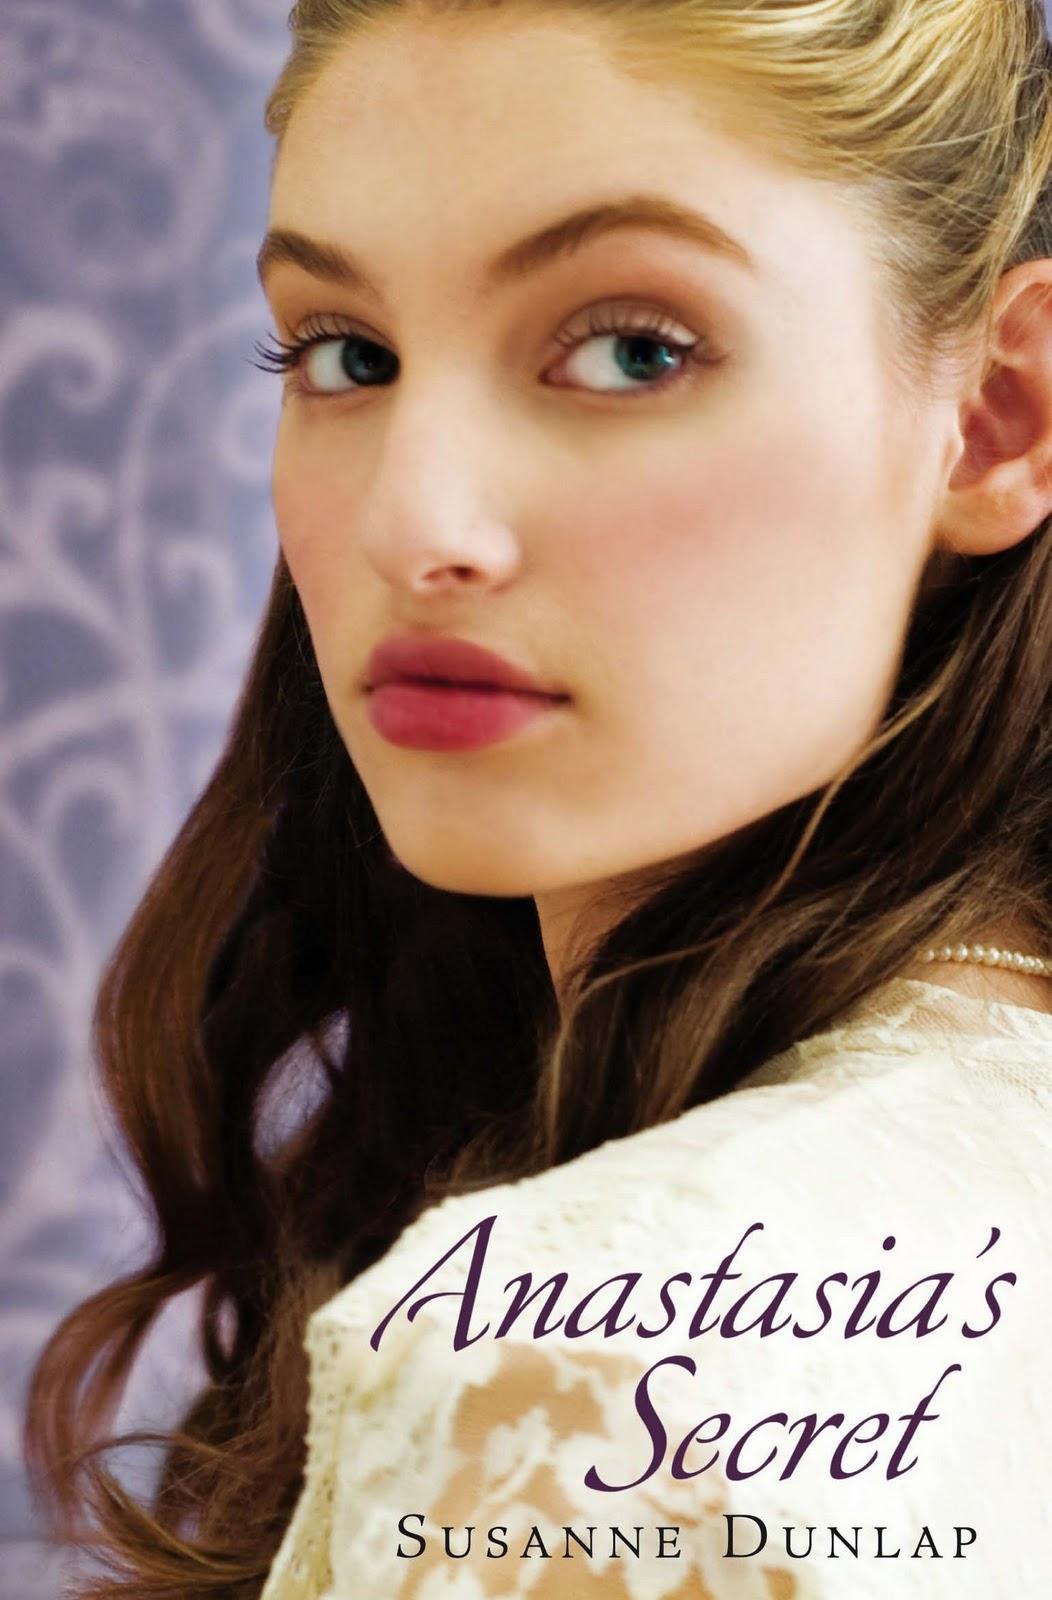 http://3.bp.blogspot.com/_d_KDljgqR08/TRPTDSl4AbI/AAAAAAAAAEg/LCY93ogPQyw/s1600/Anastasia%2527s_Secret_Susanne_Dunlap.jpg